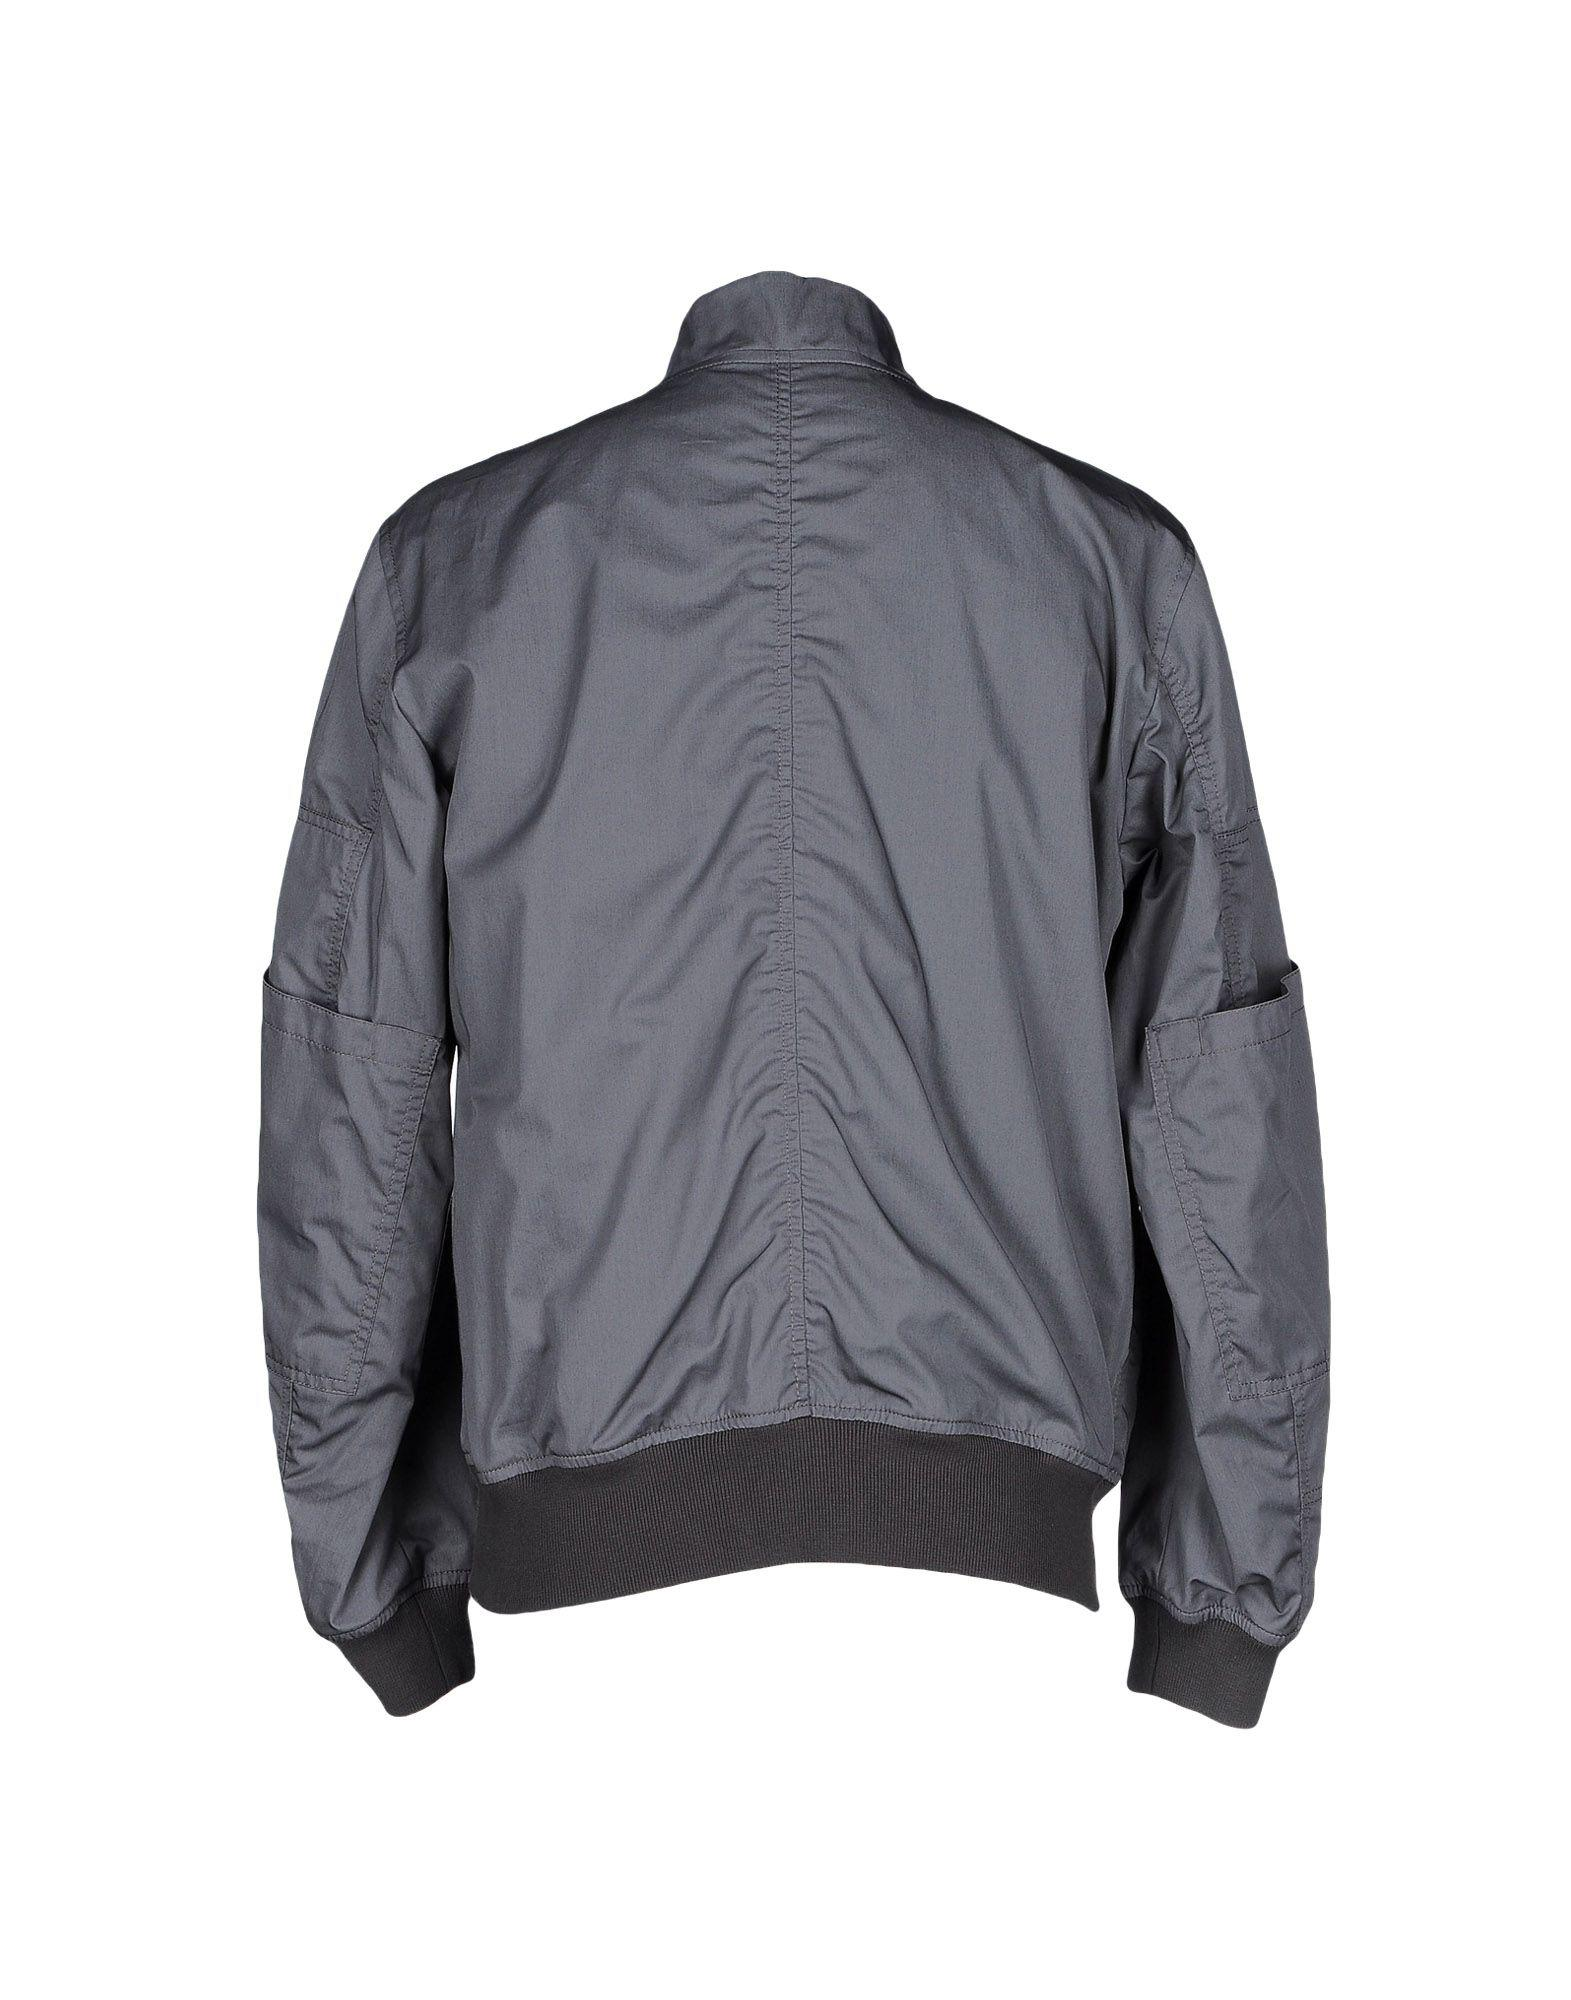 Marni Cotton Jacket in Grey (Grey) for Men